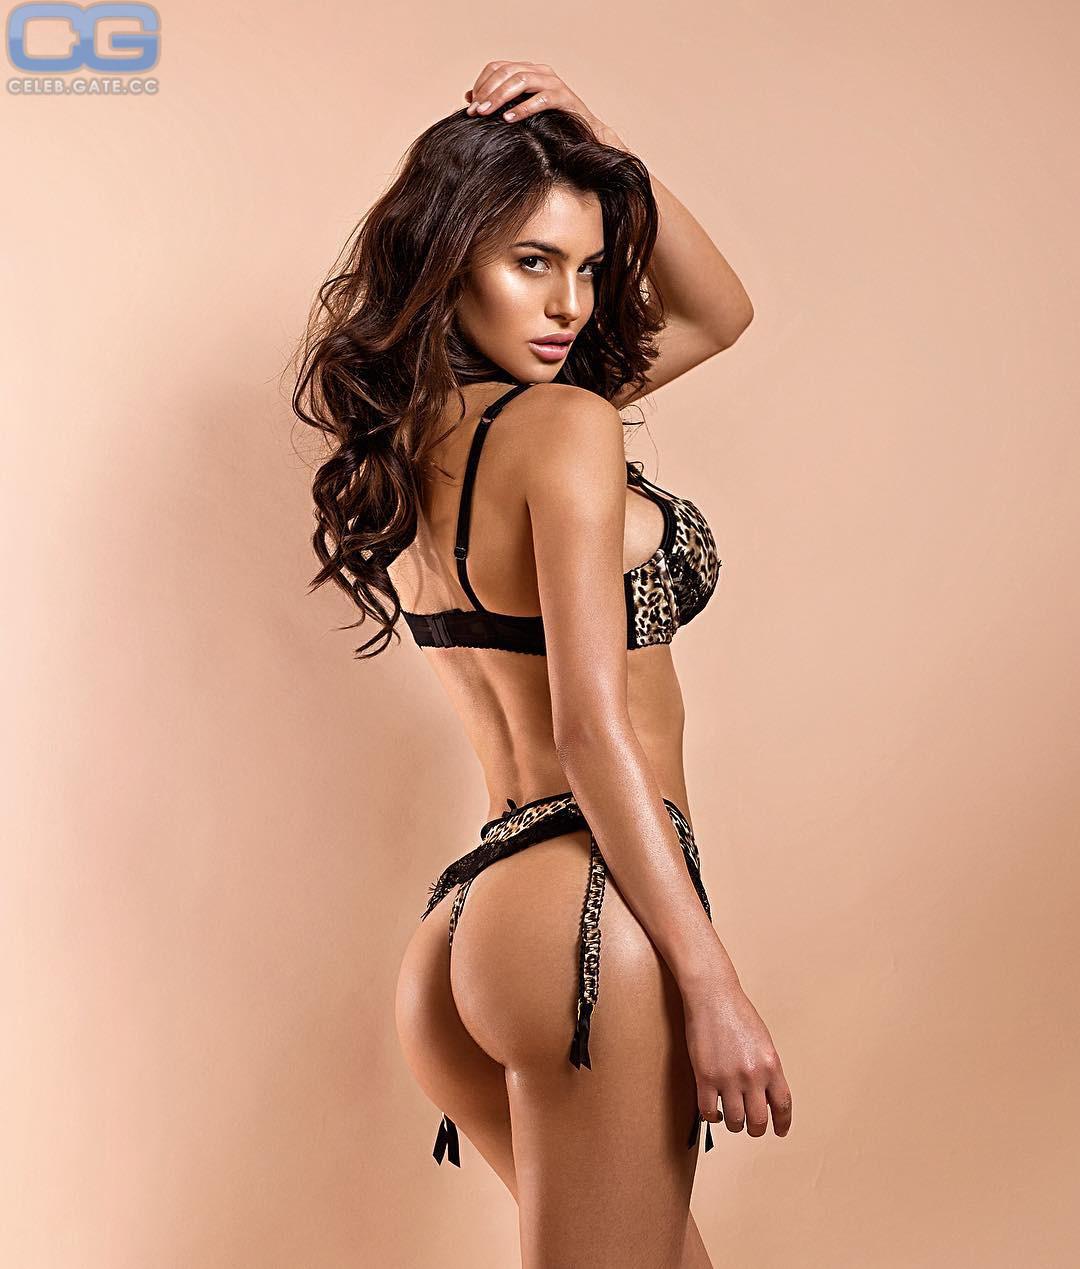 Silvia Caruso Playboy photo 14